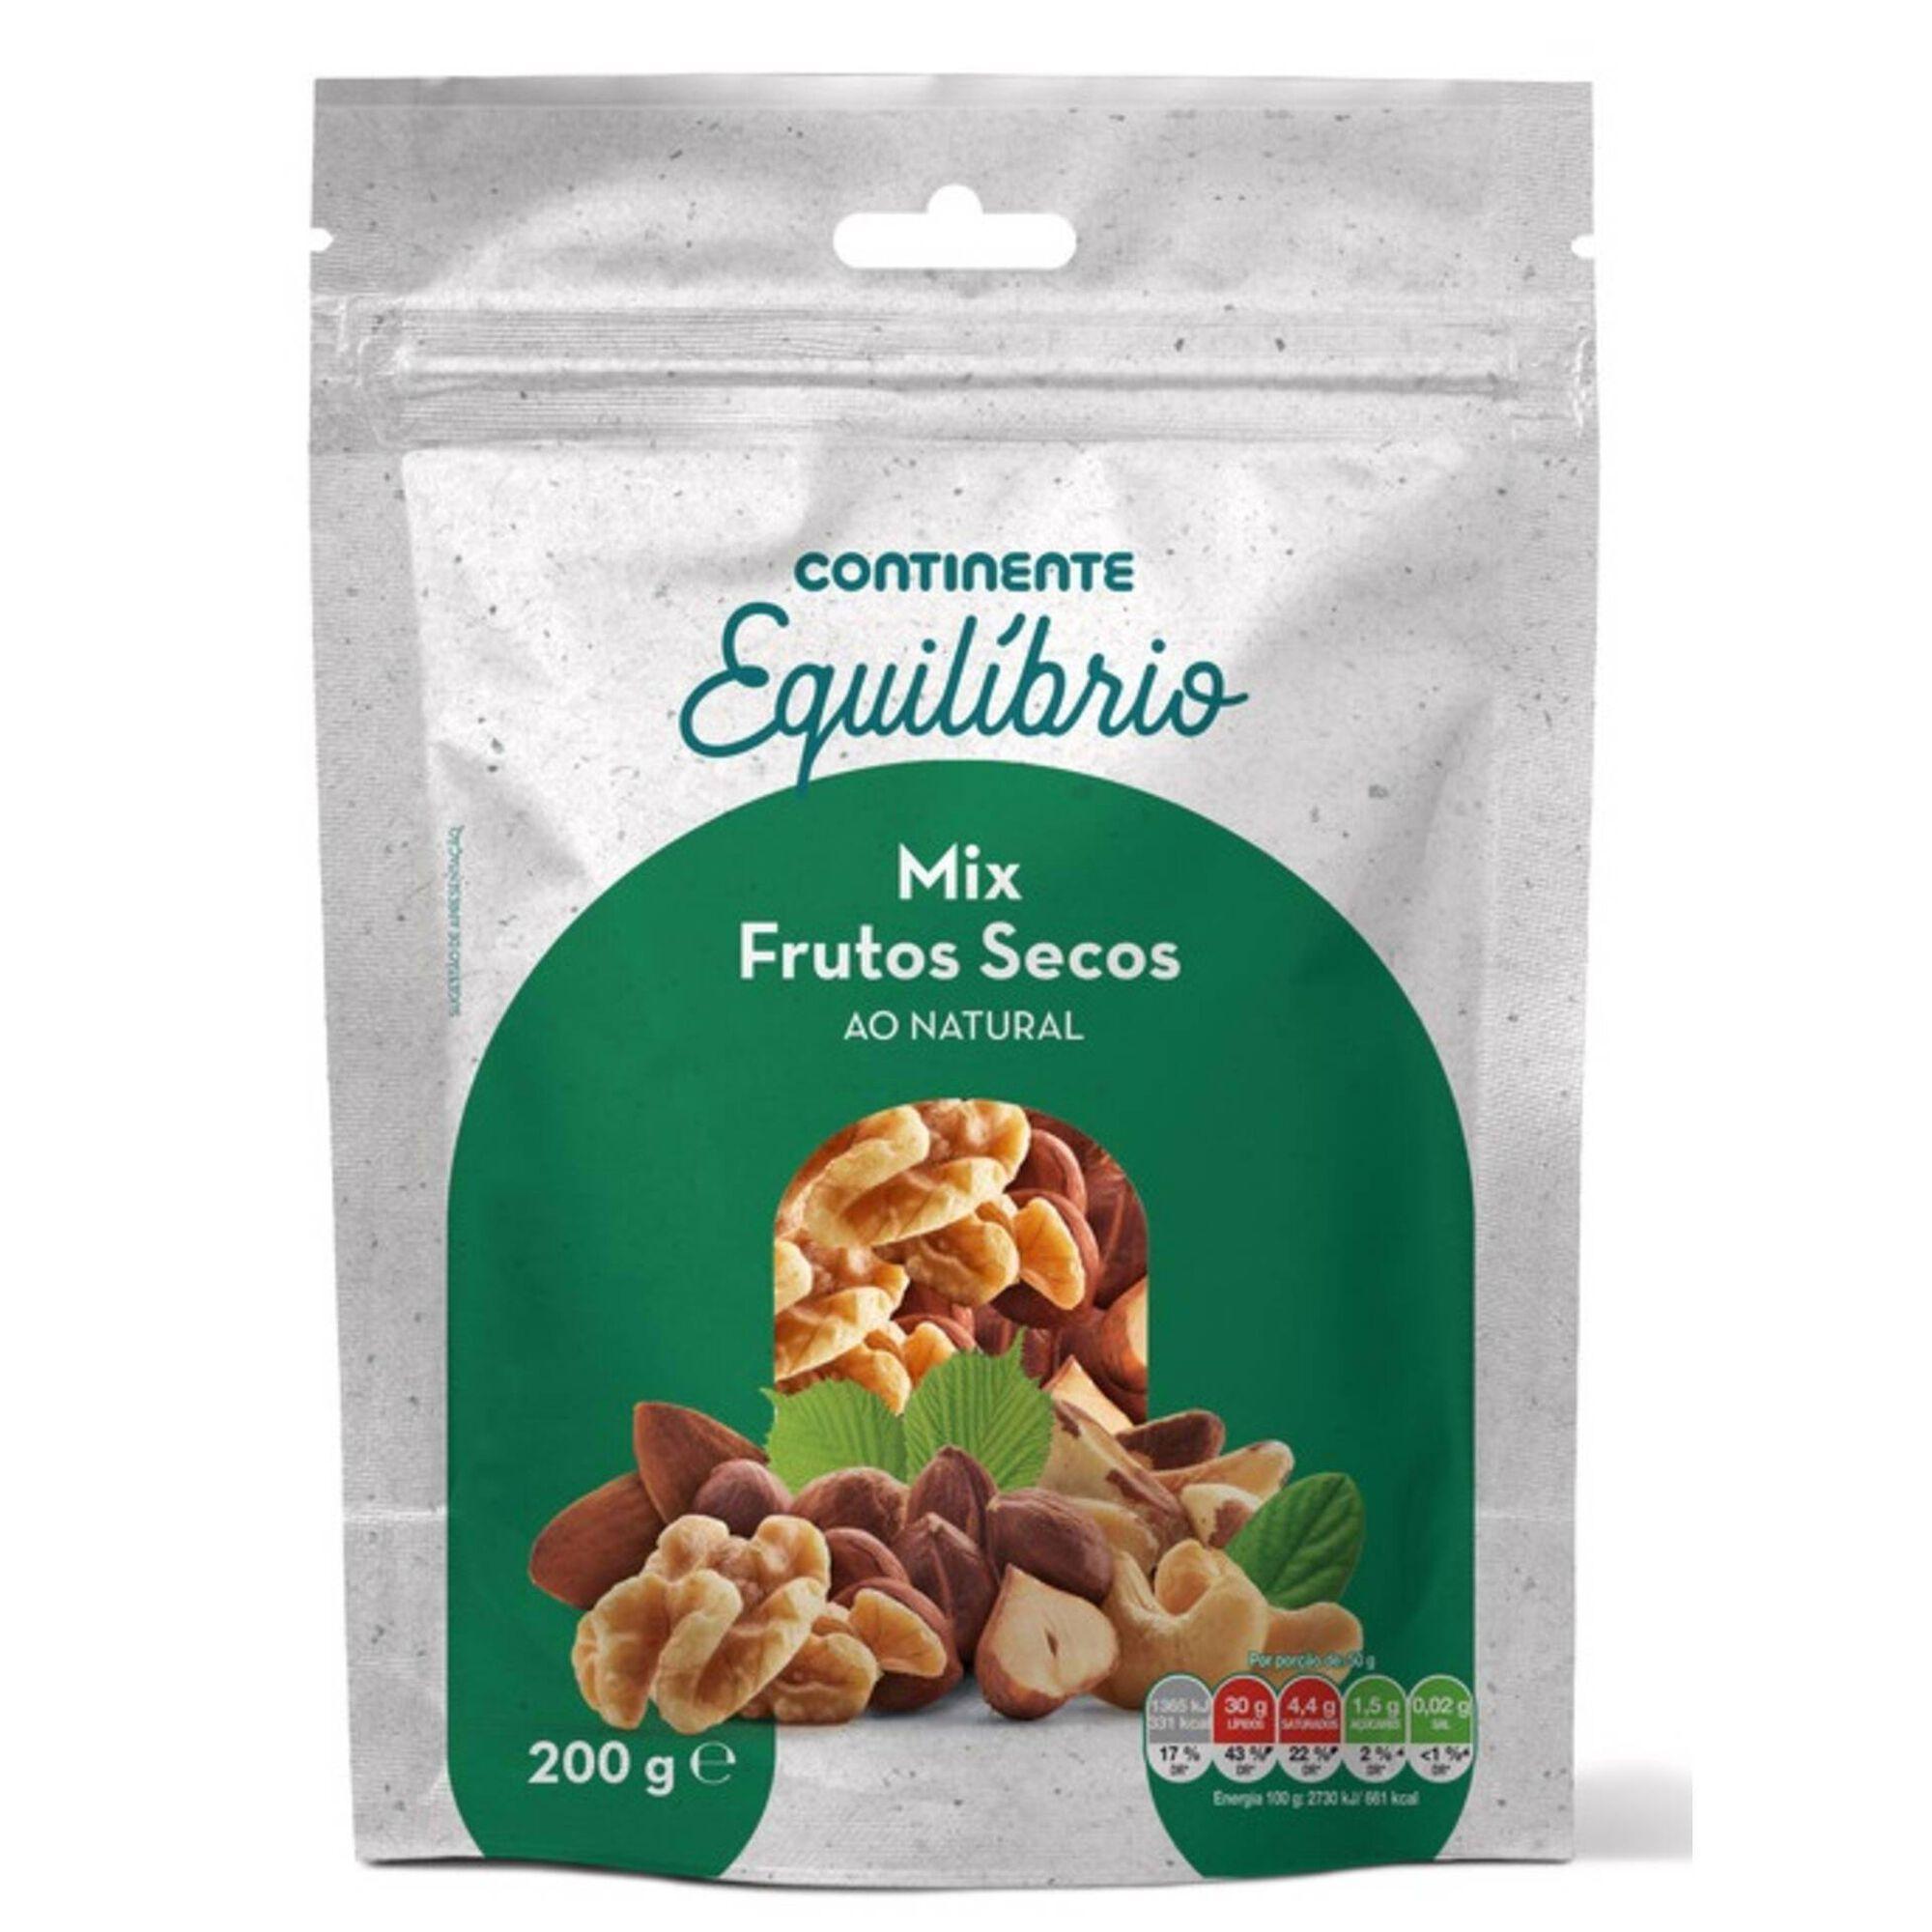 Snack Mix Frutos Secos Natural